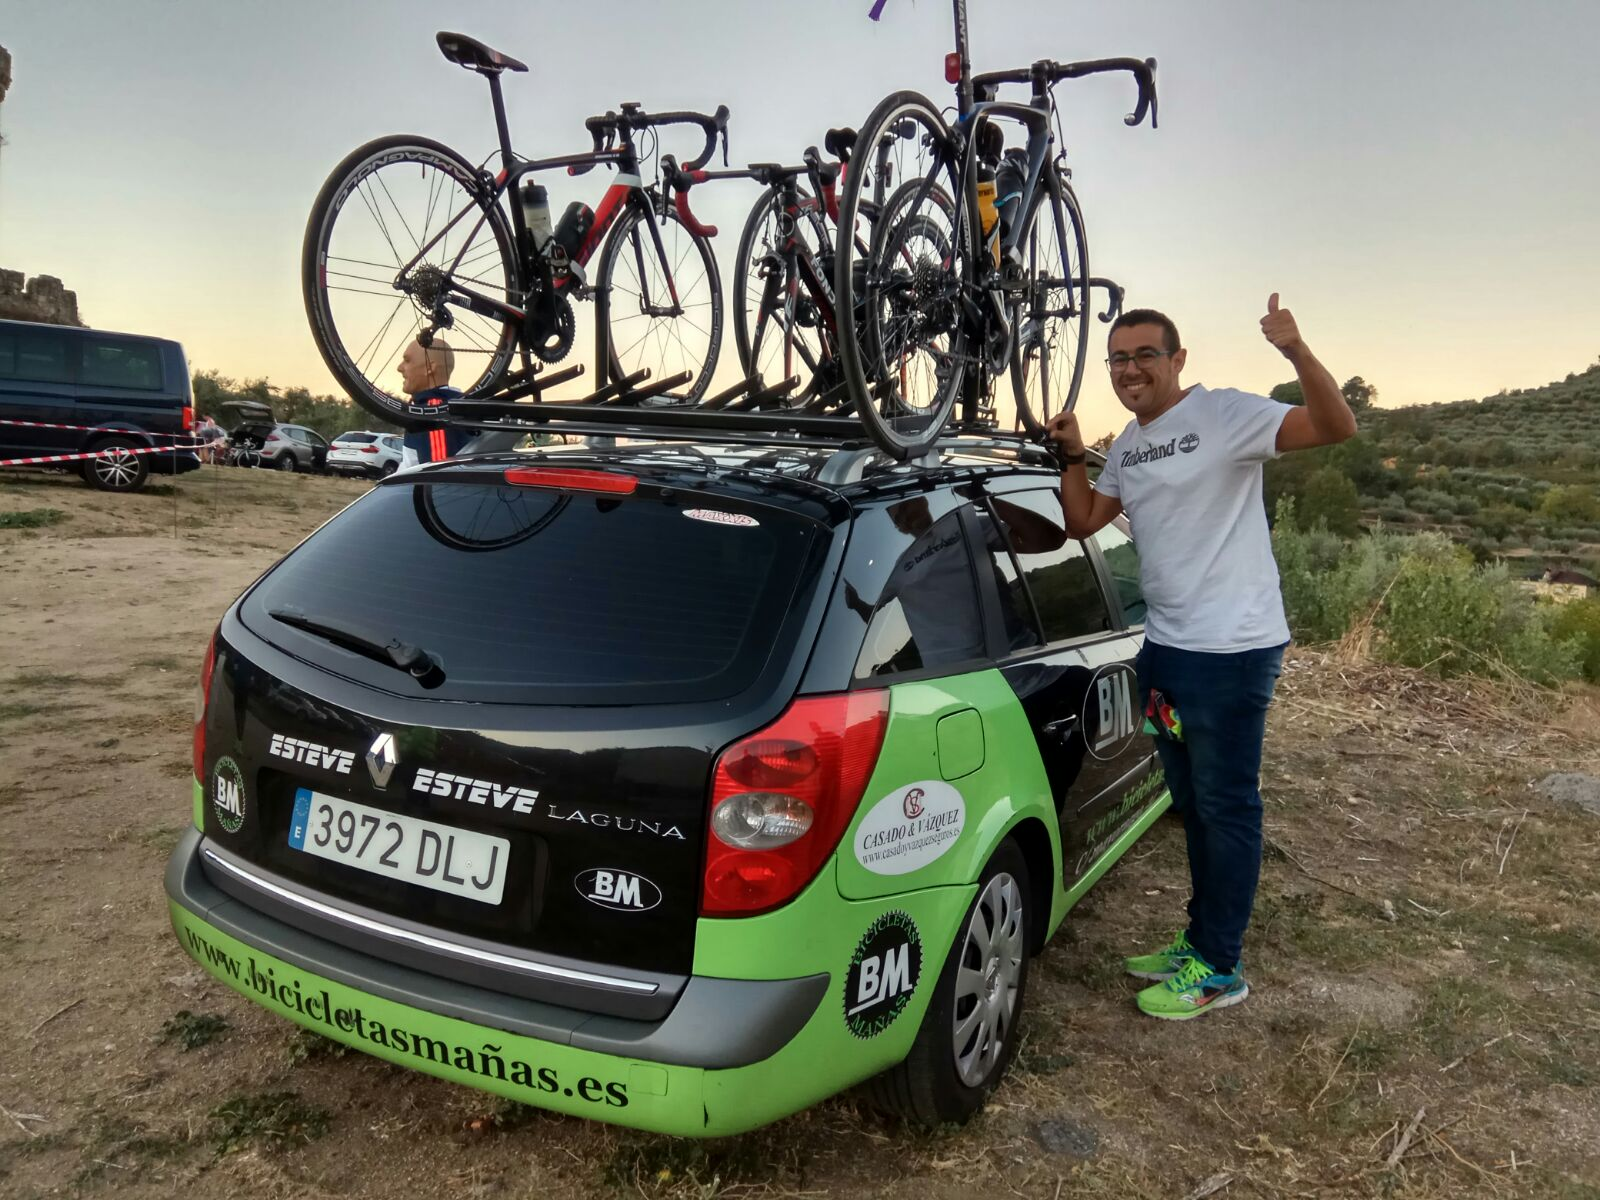 Grupeta_BM_Salida_Avila_Gredos_Perfil_5_Biciletas Mañas BM-Tienda-de-venta-y-reparacion-de-bicicletas-Ridley-Madrid